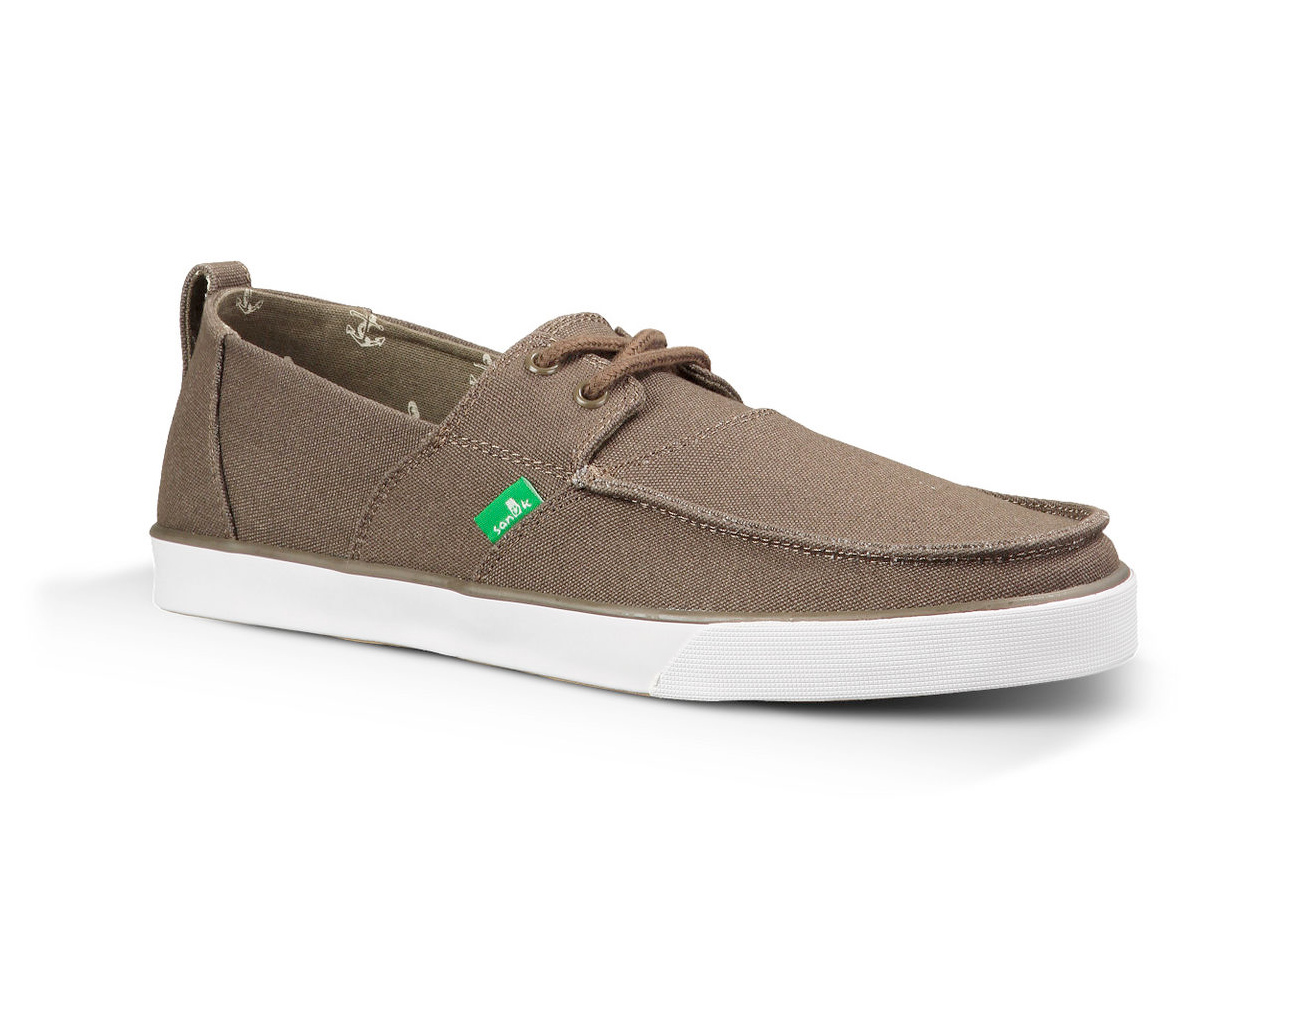 Sanuk Slip On Boat Shoes